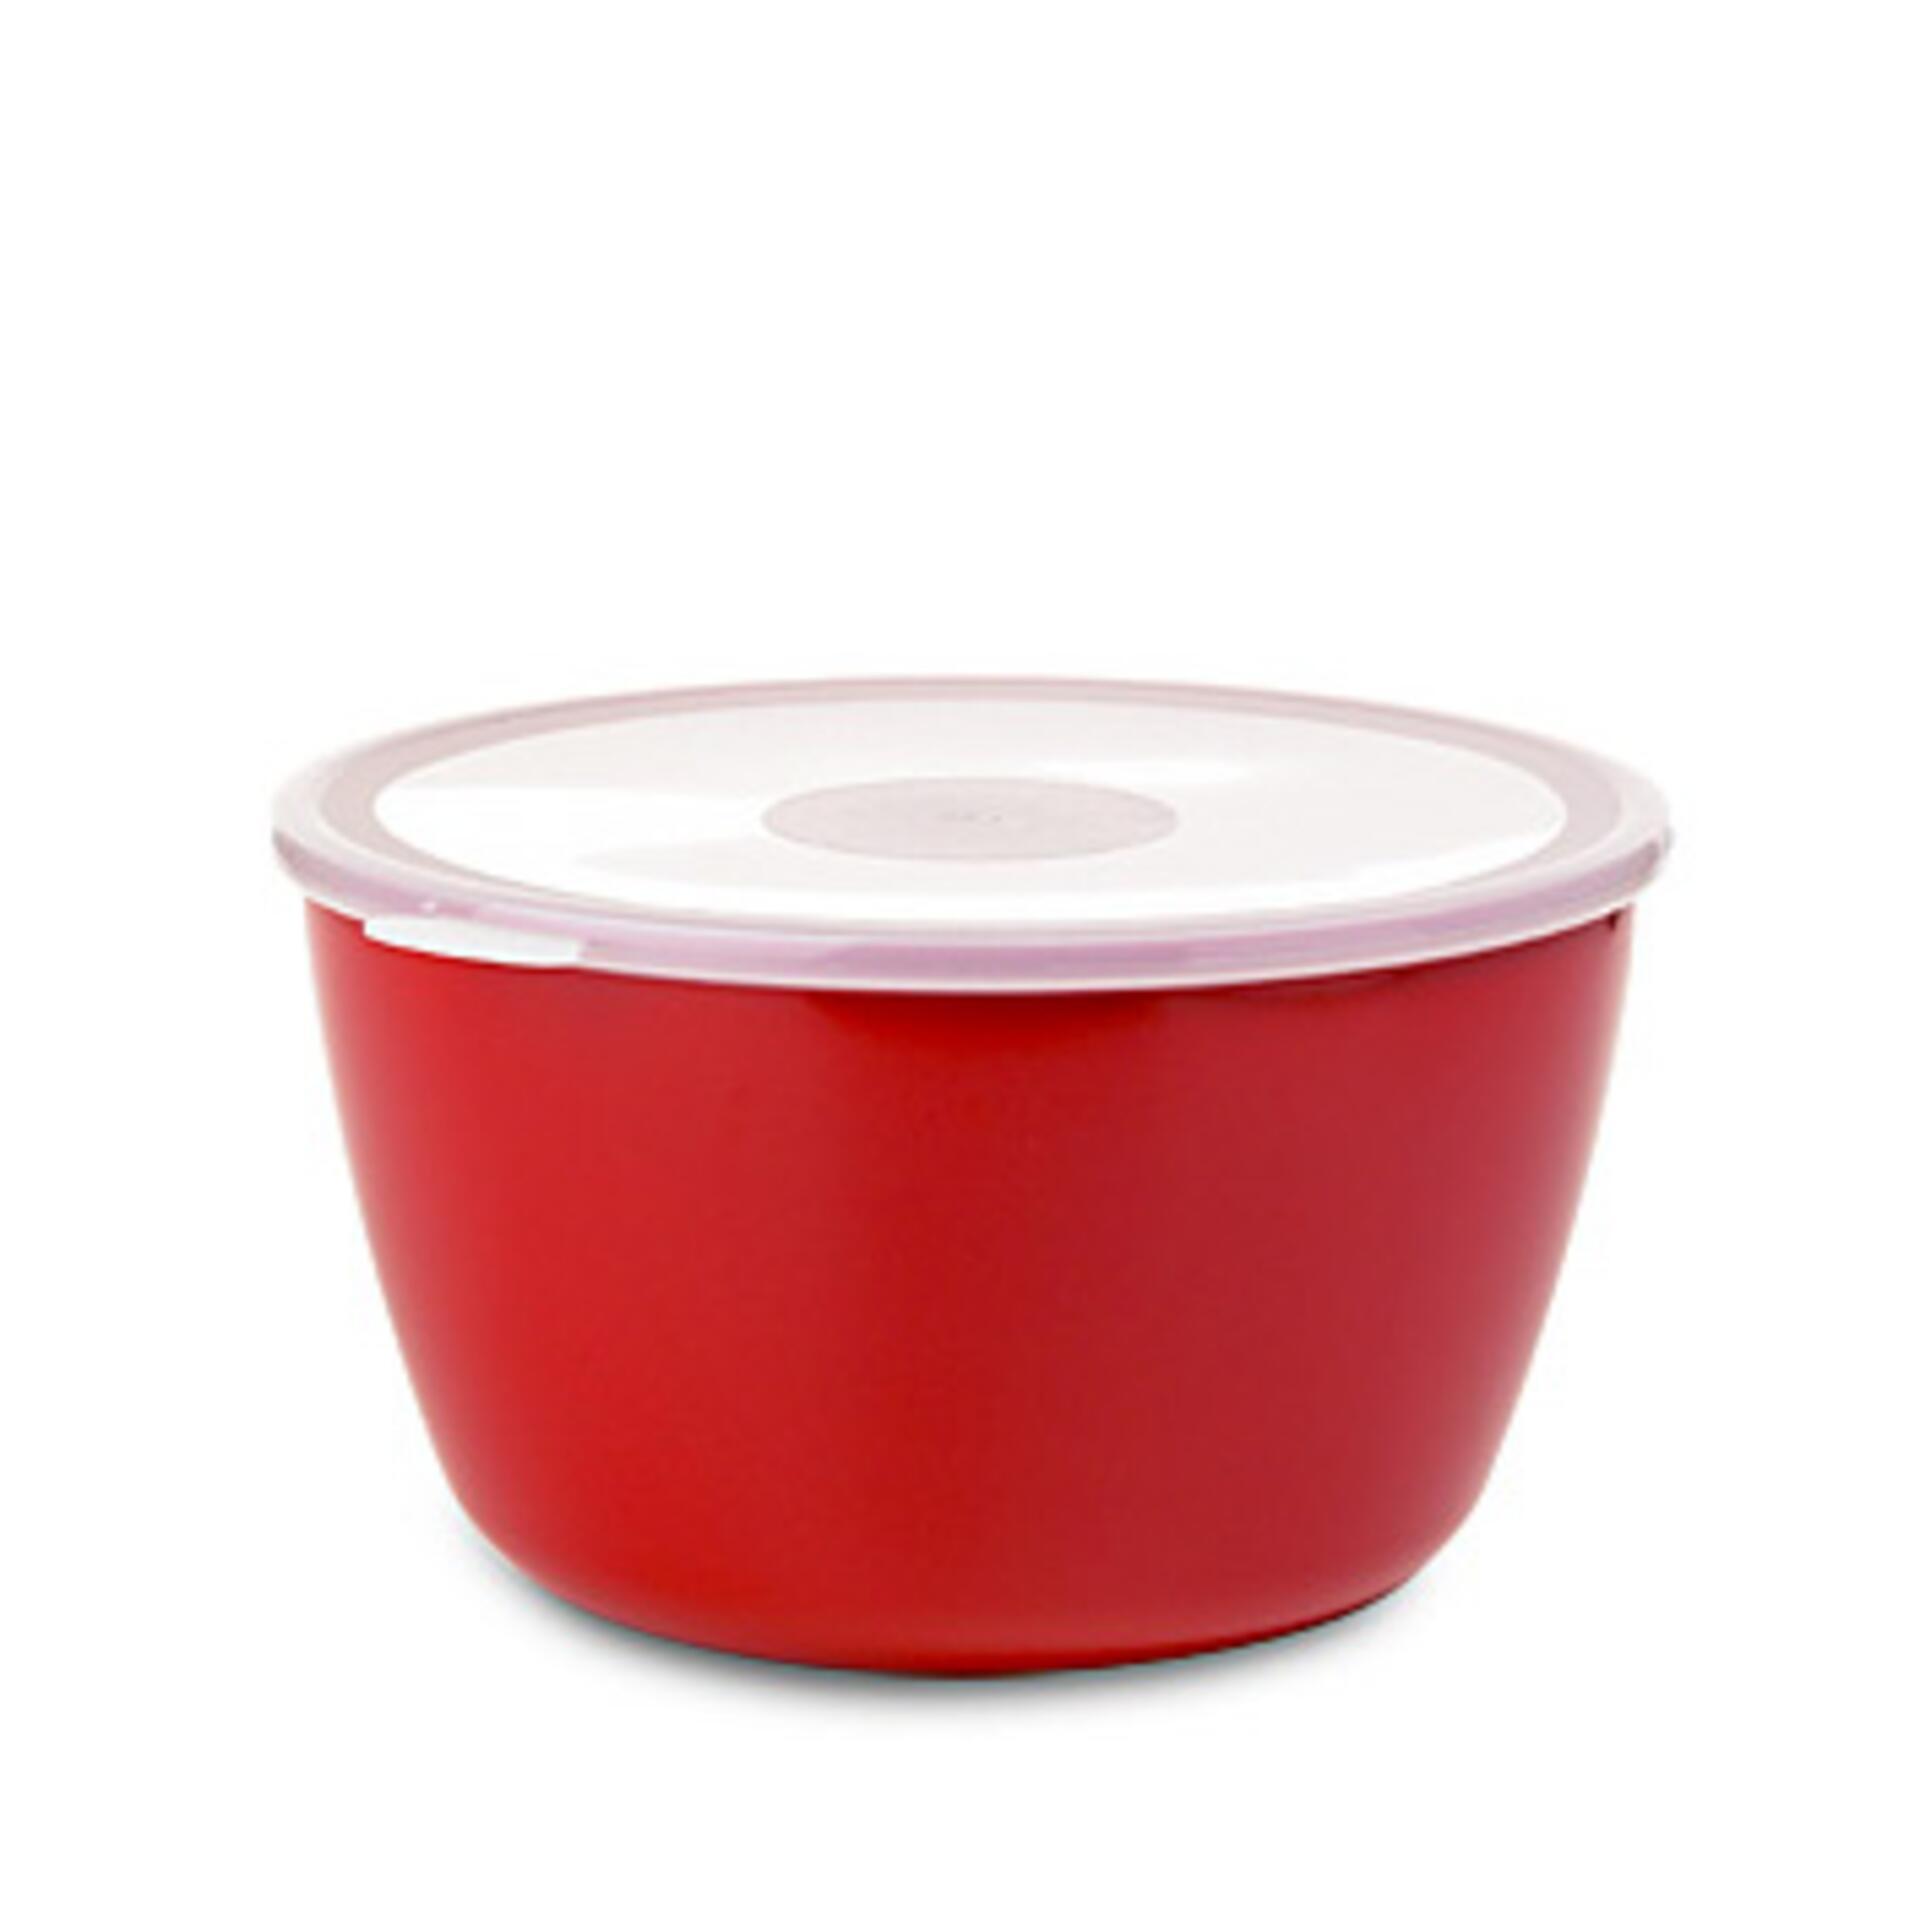 Rosti Mepal Volumia Aufbewahrung 3 l Rot